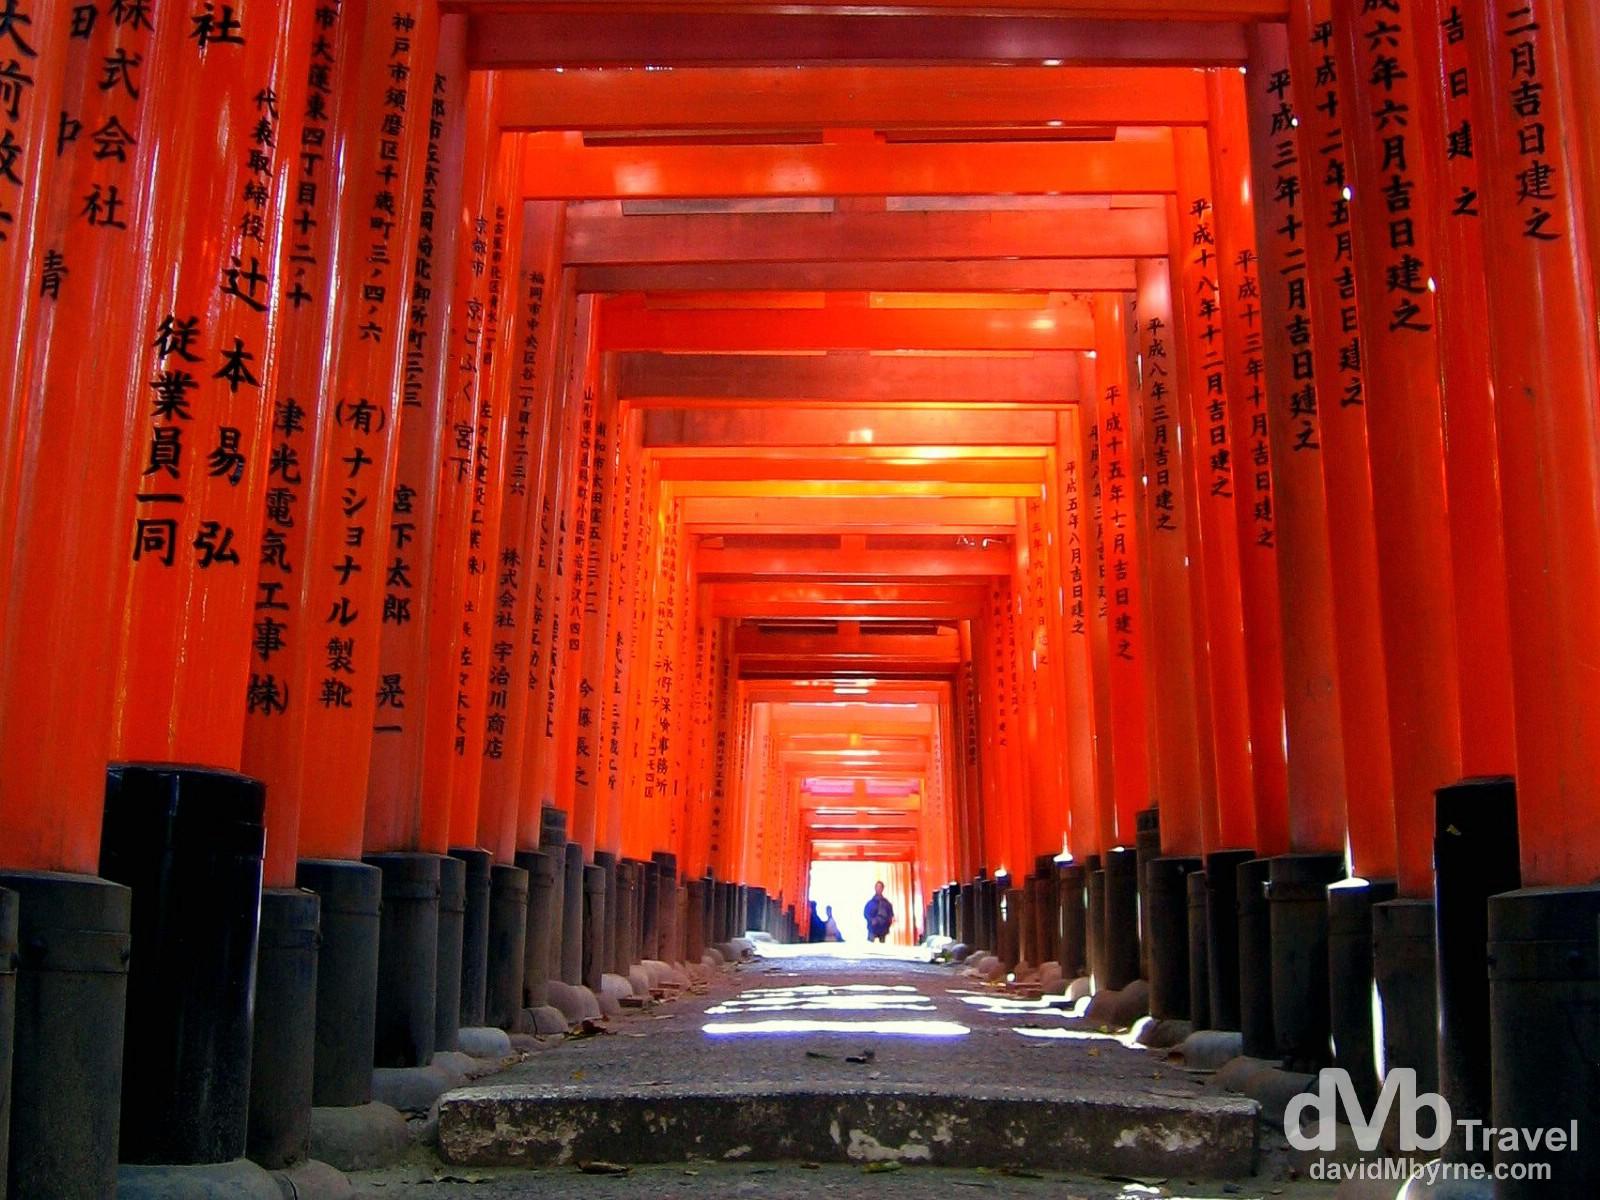 A passageway of Torii gates at the Fushimi Inari Taisha shrine, Kyoto, Japan. November 21st, 2007.